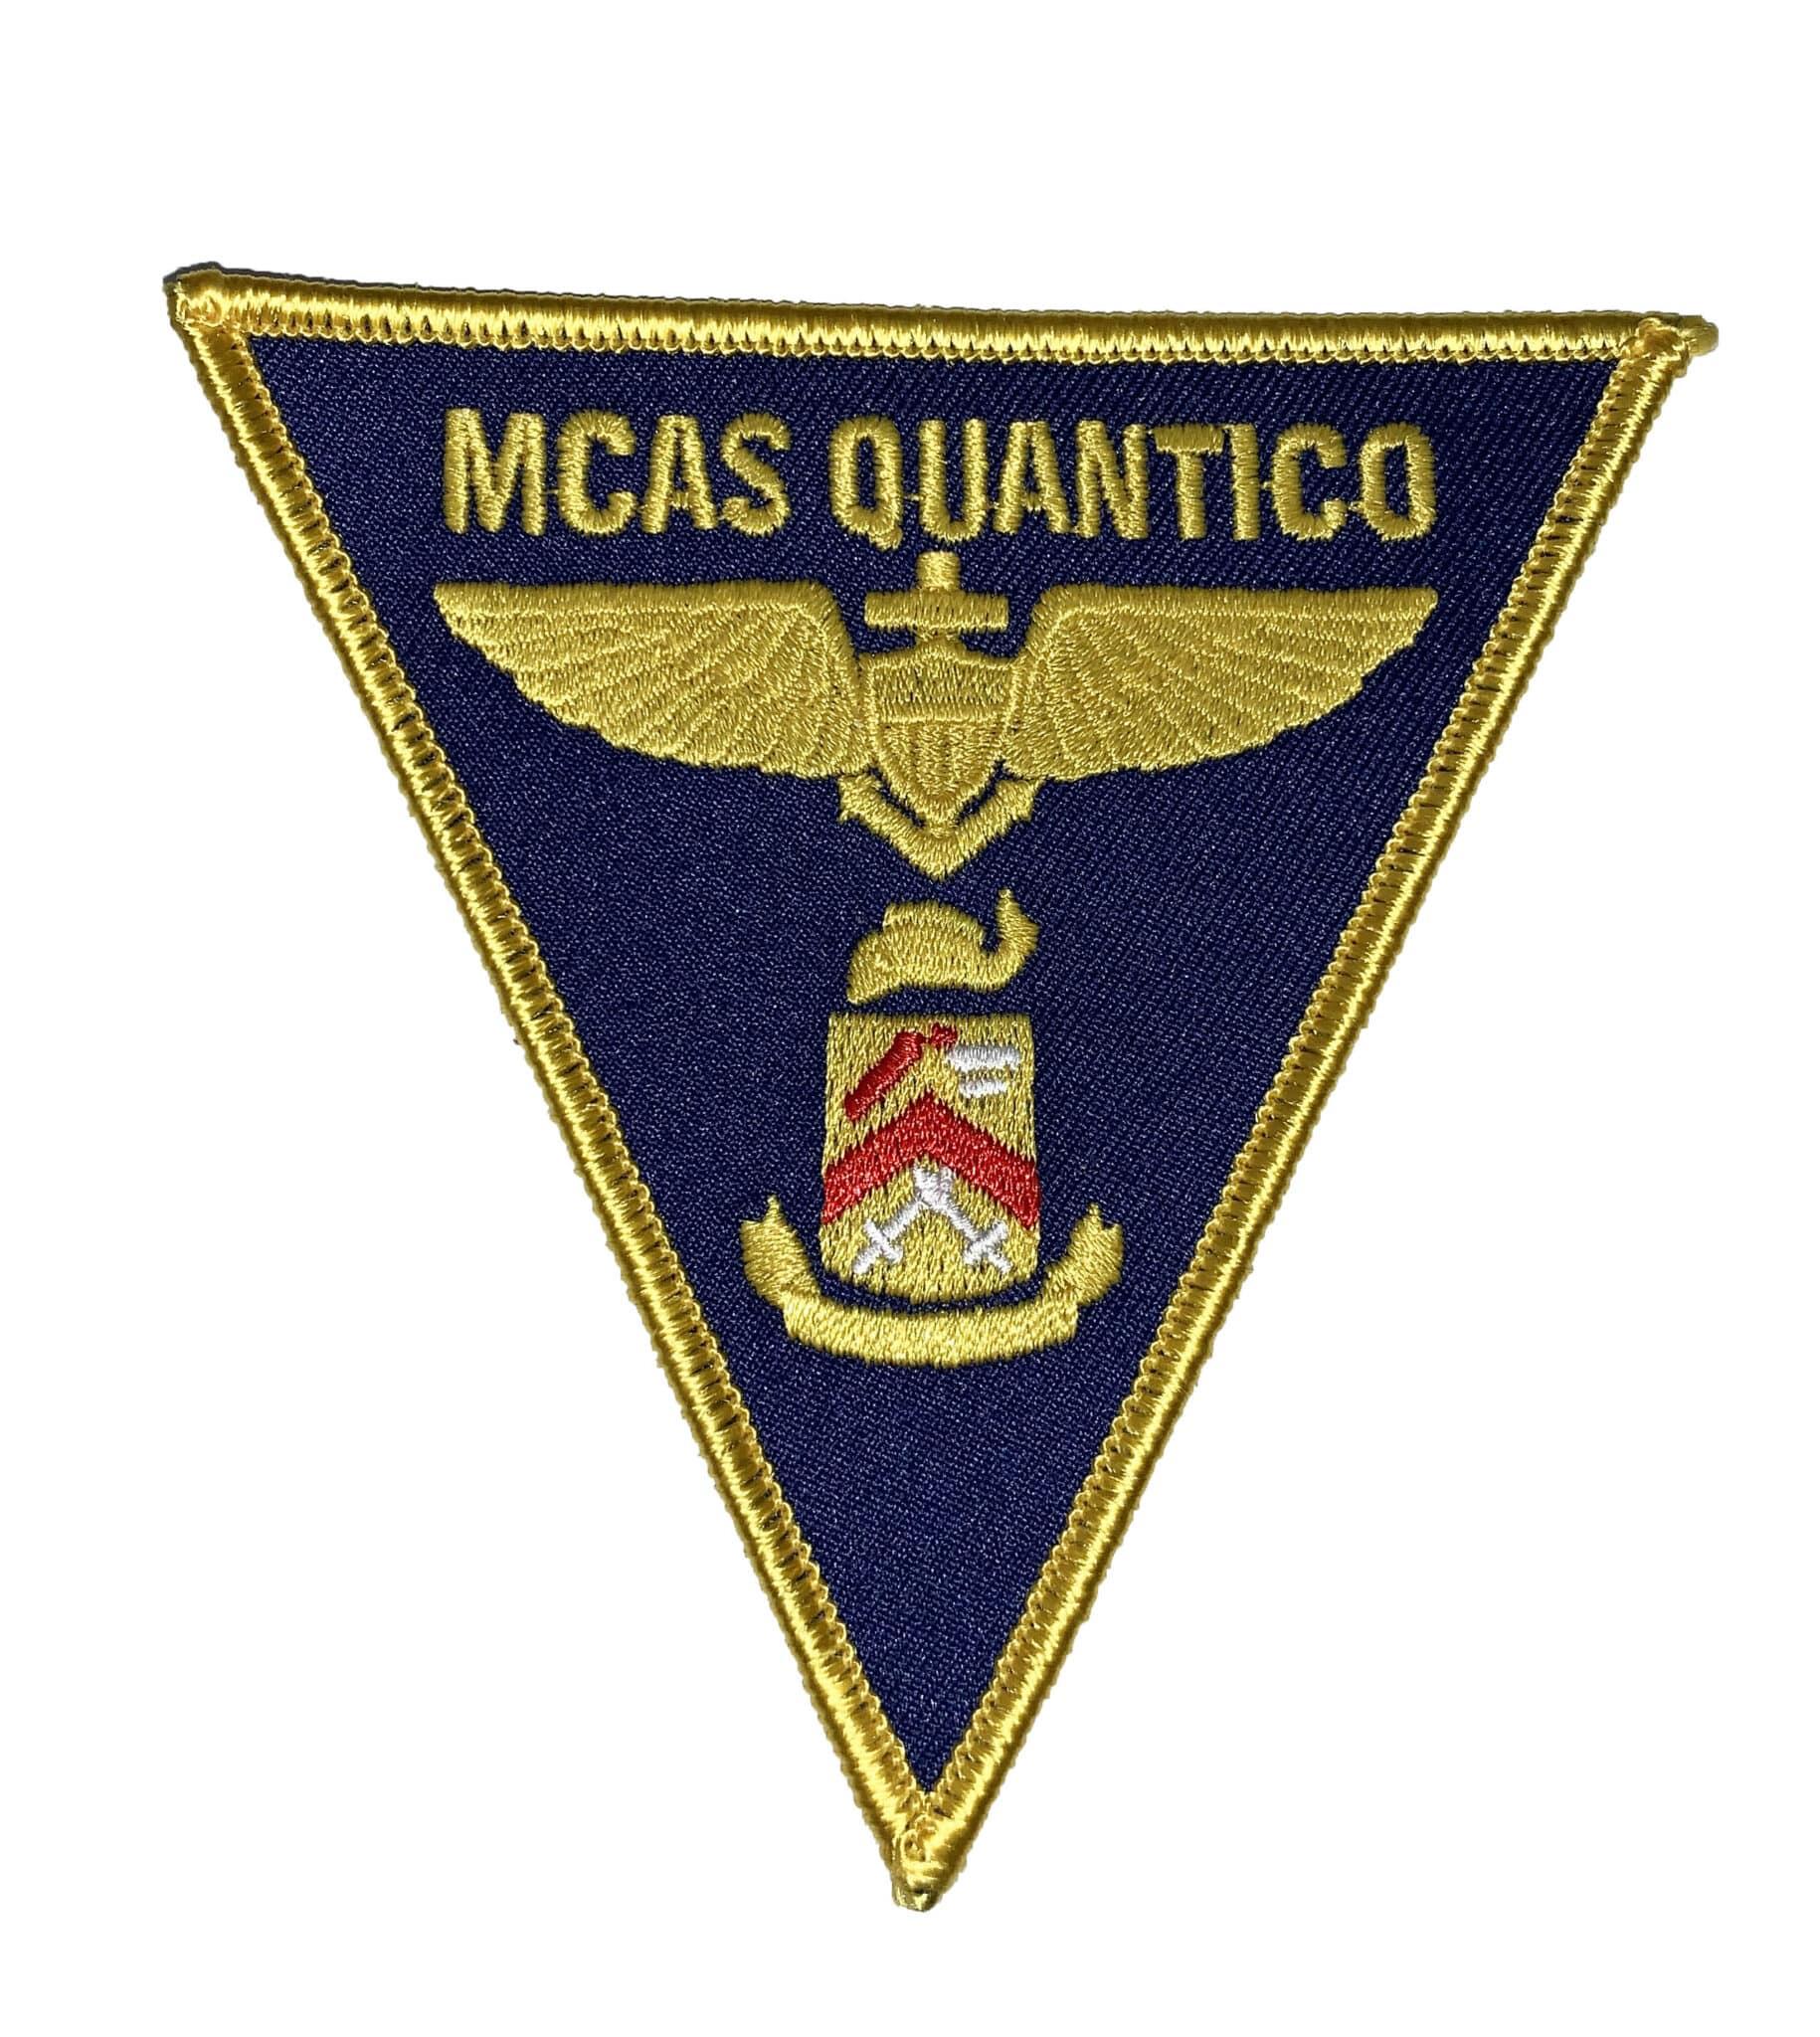 MCAS Quantico Patch – Sew On